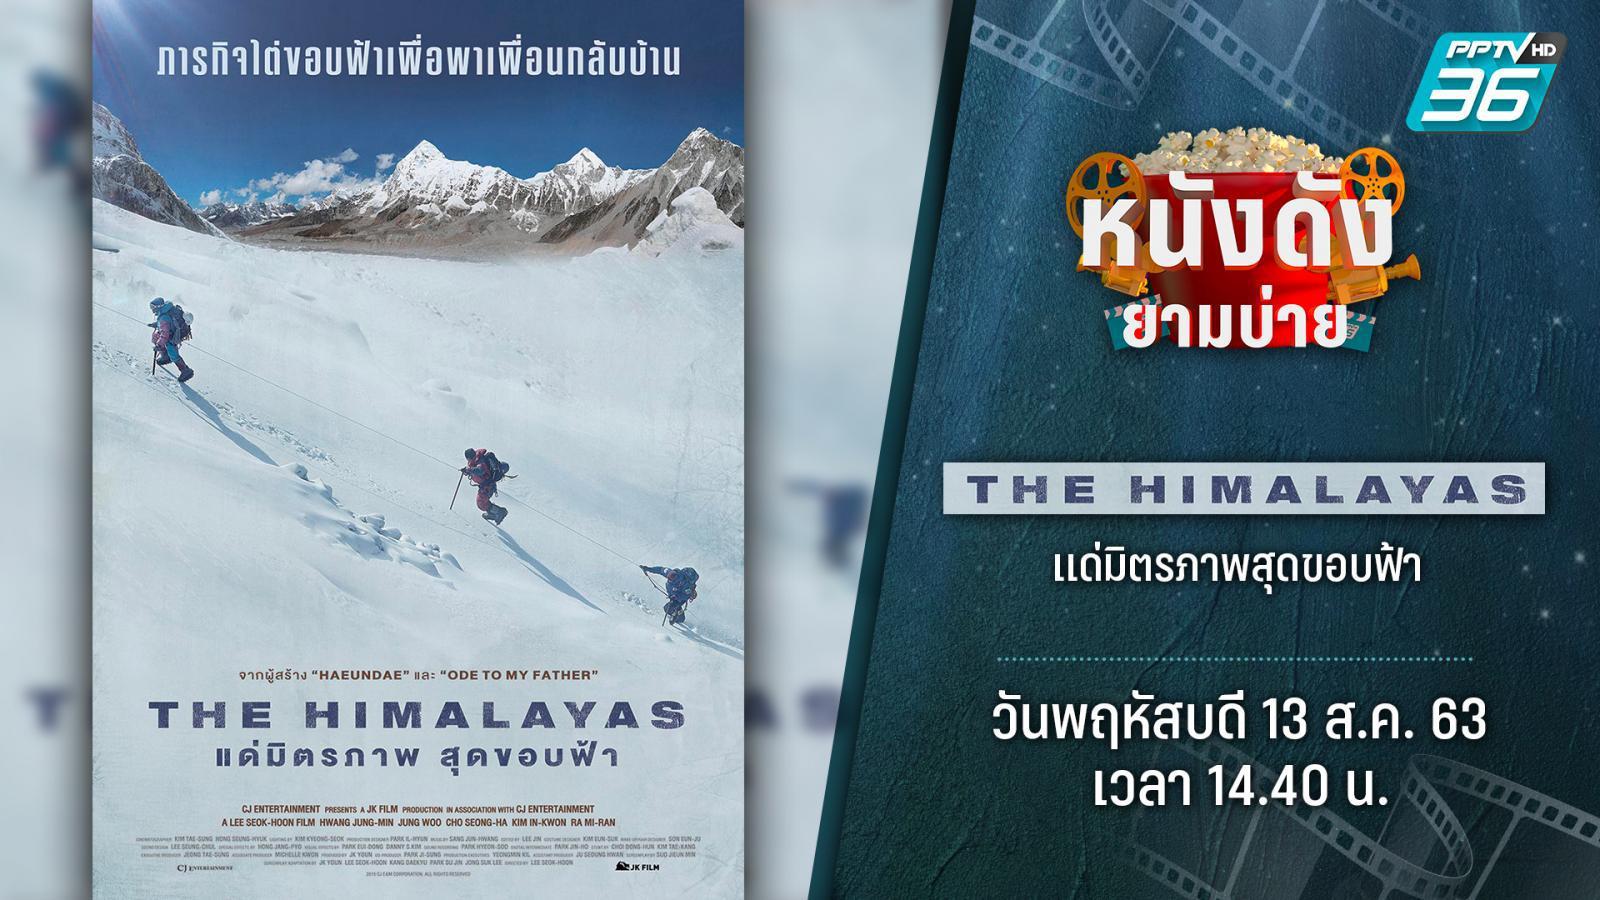 The Himalayas แด่มิตรภาพสุดขอบฟ้า